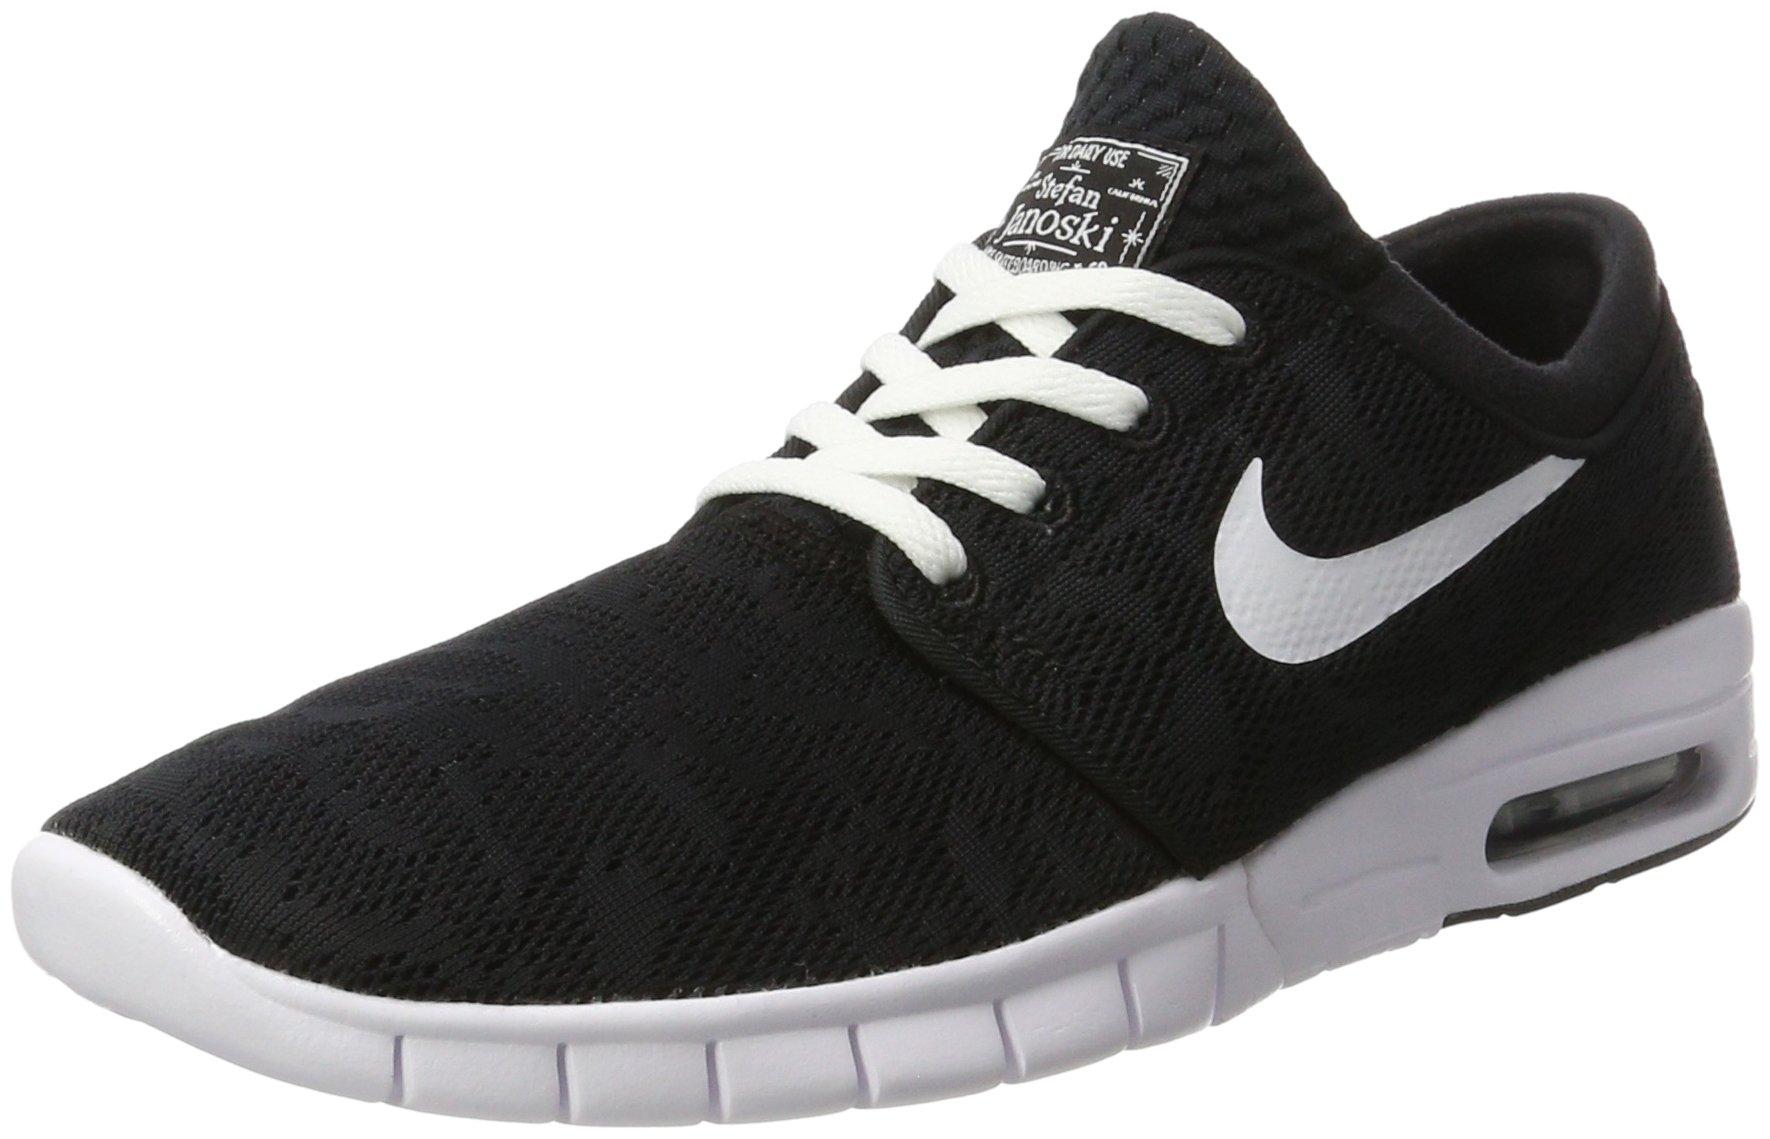 Nike Stefan Janoski Max Trainers- Buy